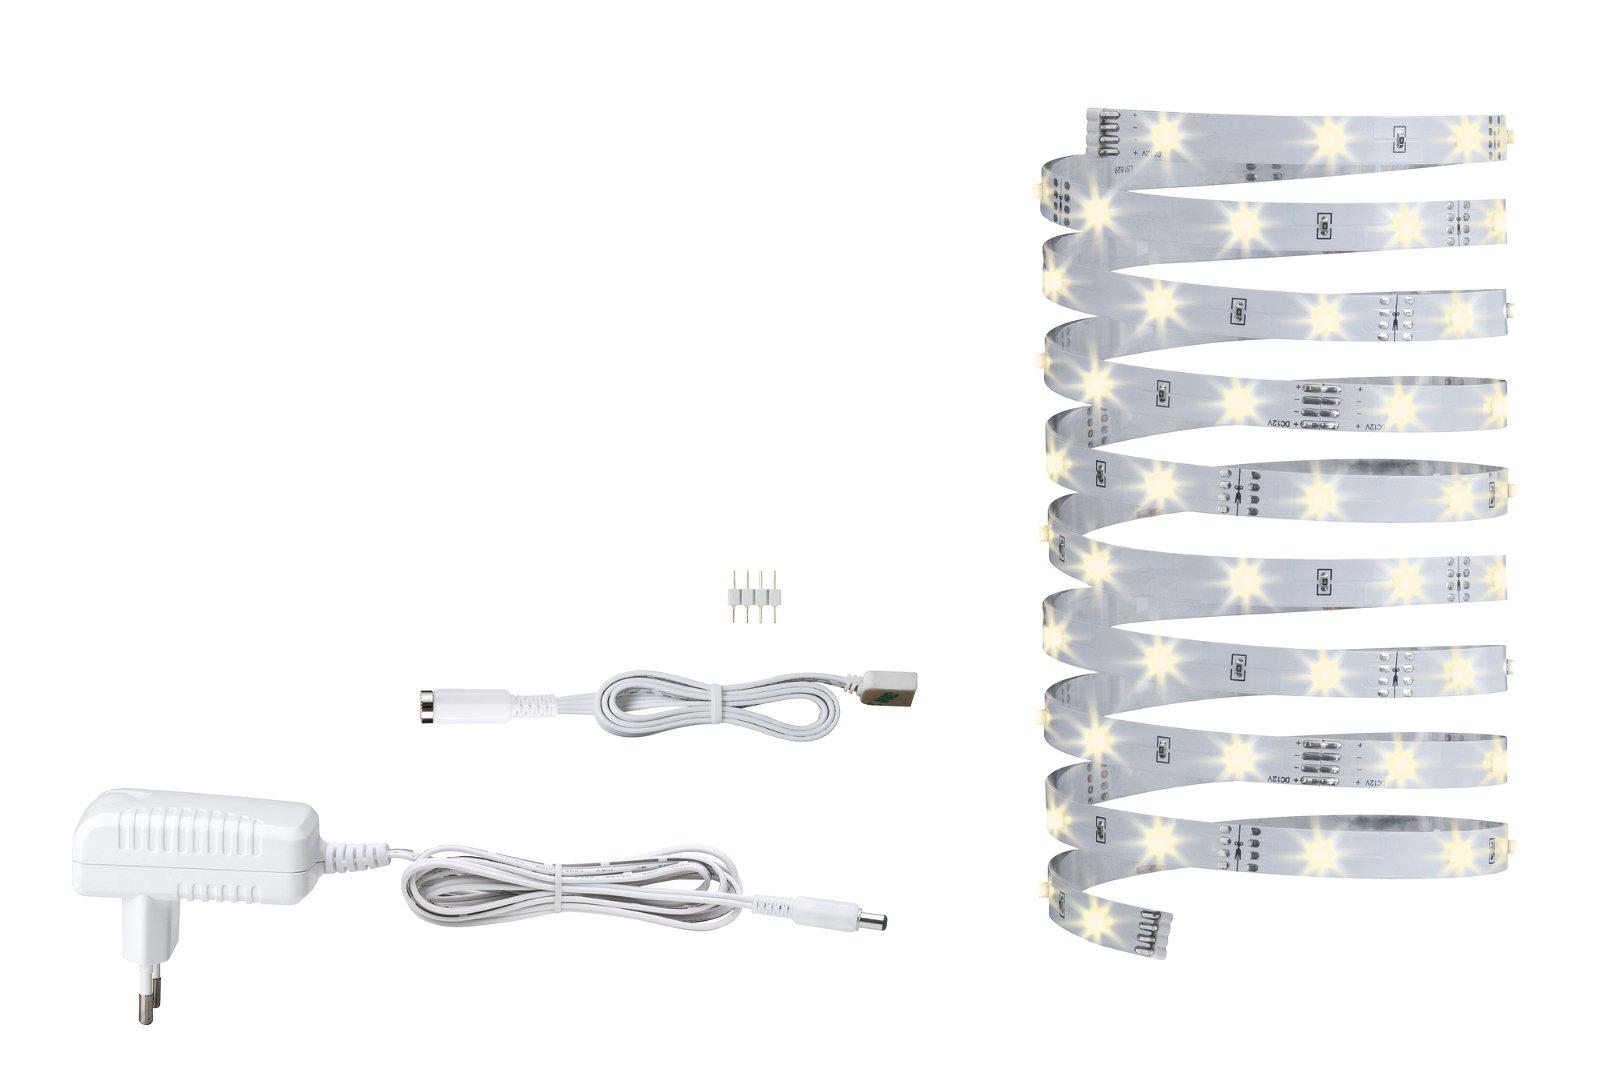 YourLED ECO LED Strip Warmweiß Basisset 3m 6,8W 160lm/m 3000K 12VA